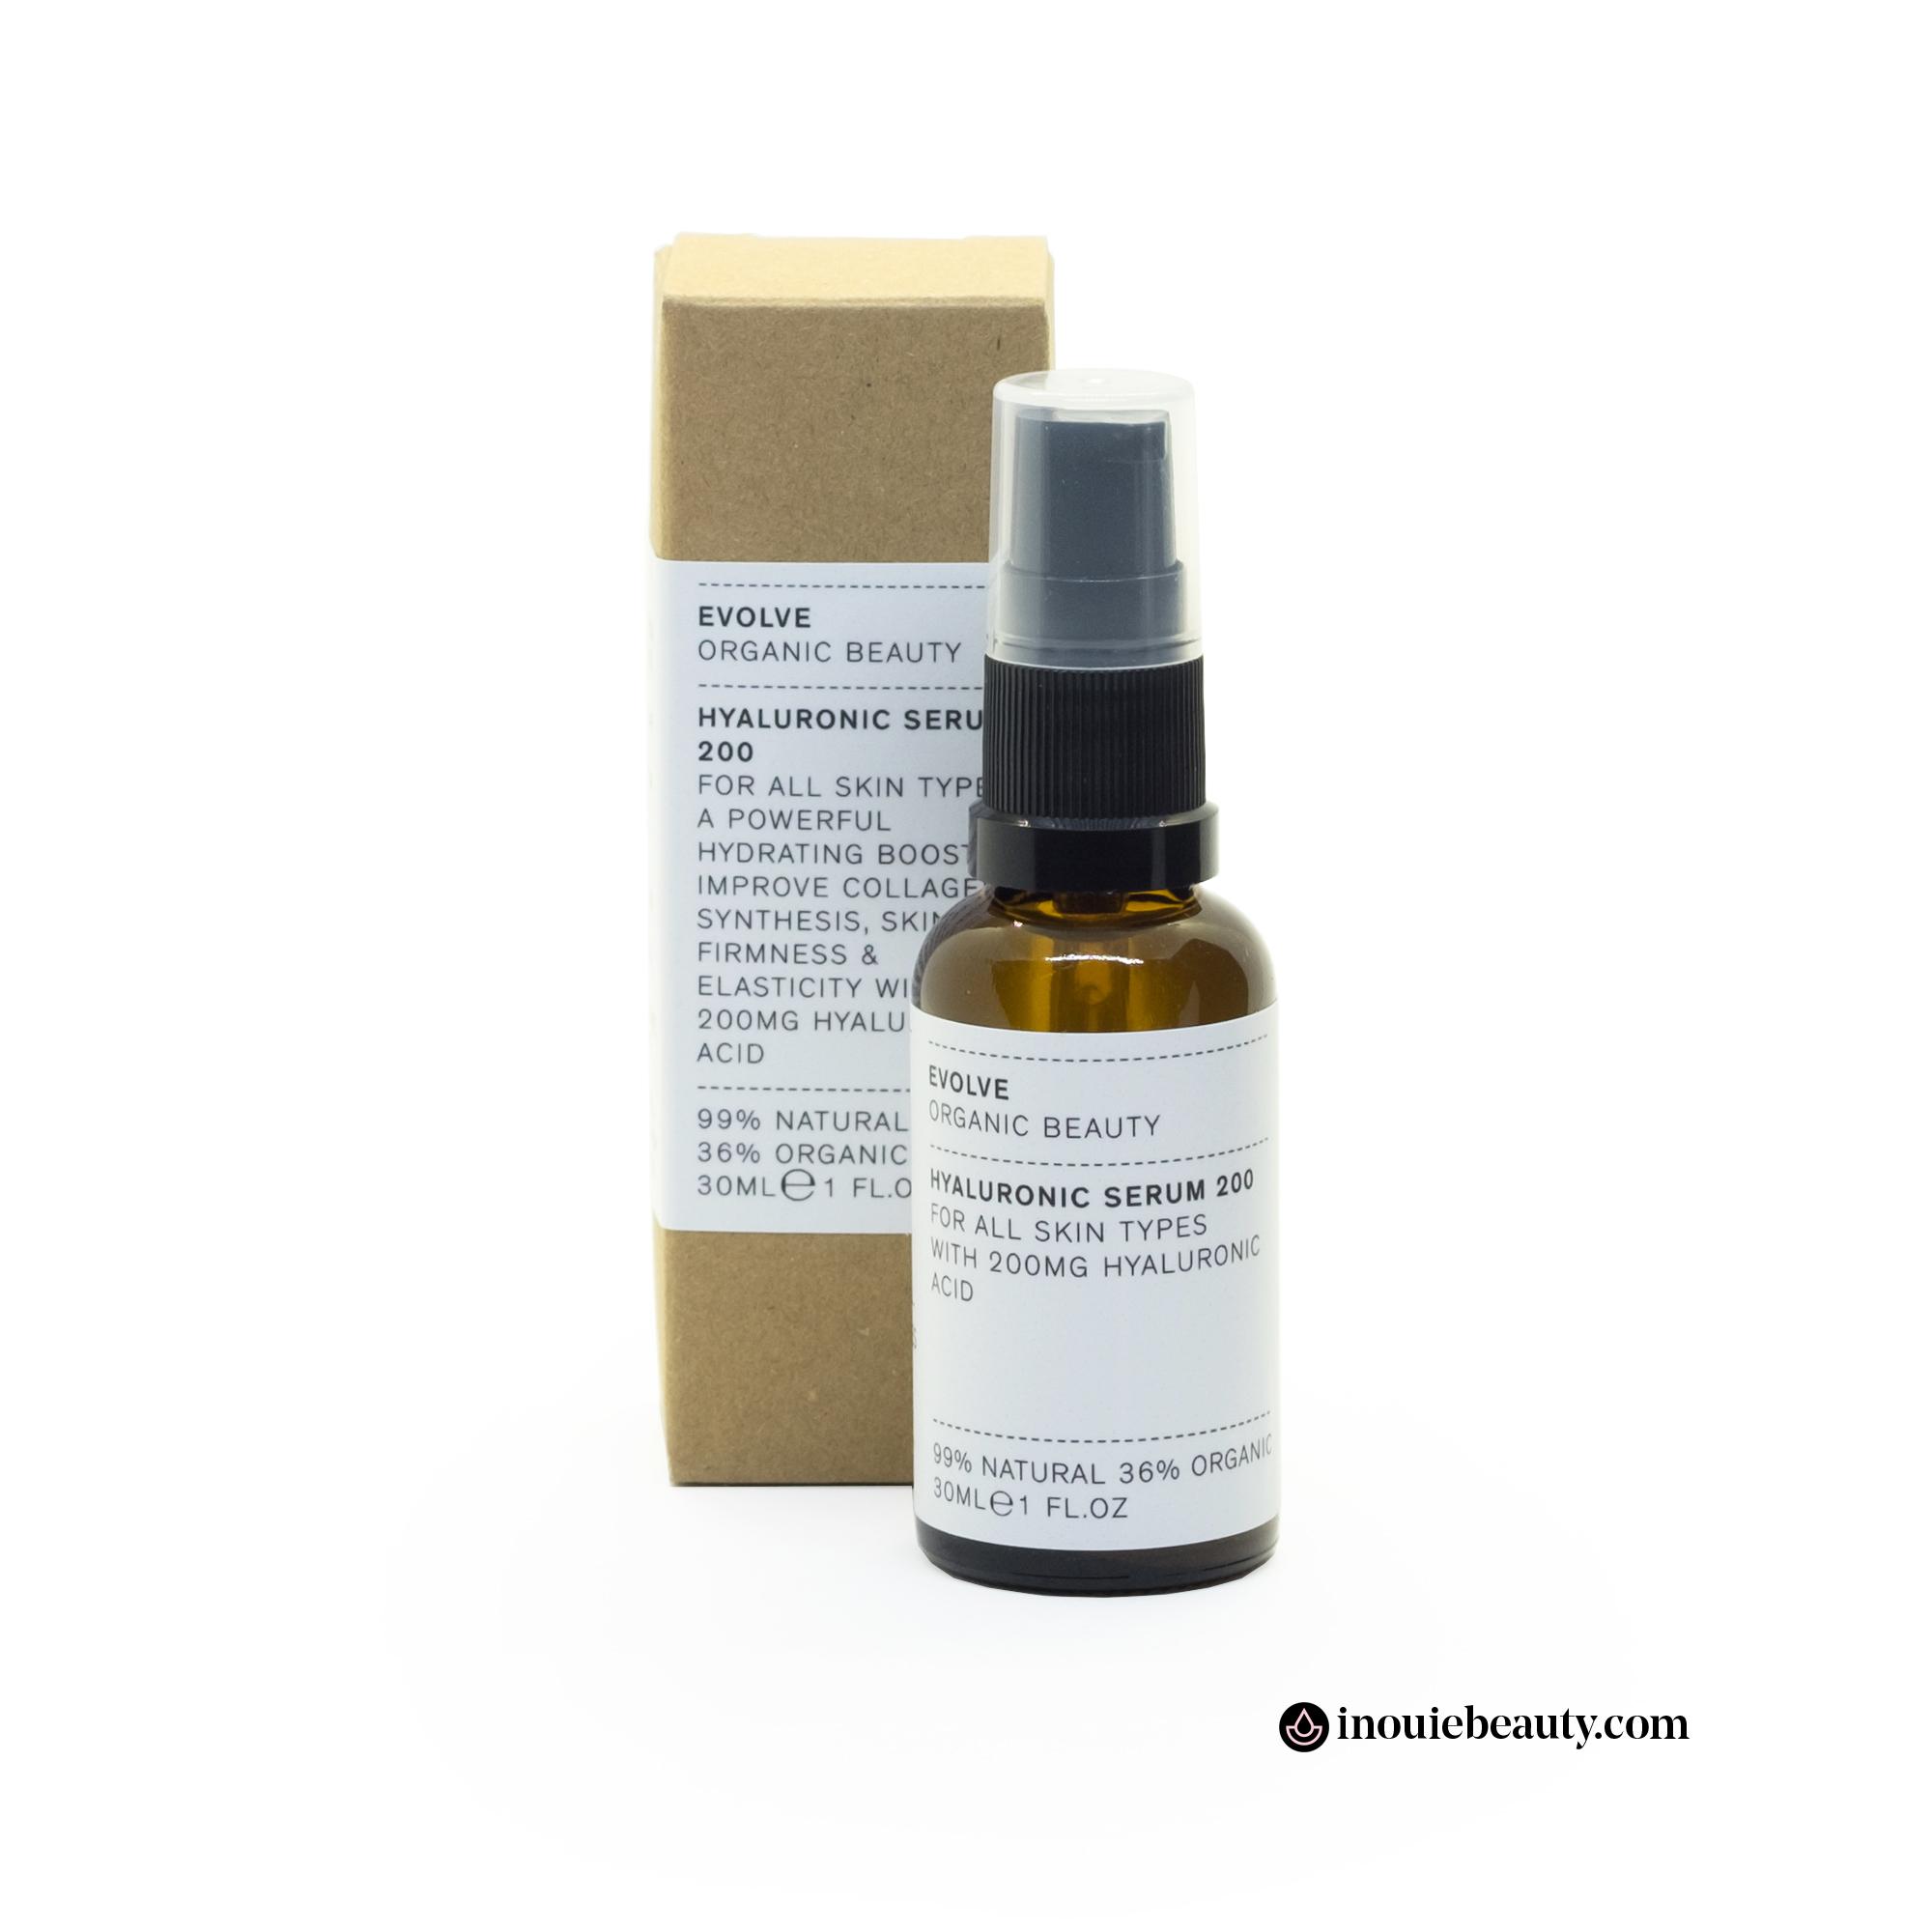 Evolve Hyaluronic Serum 200